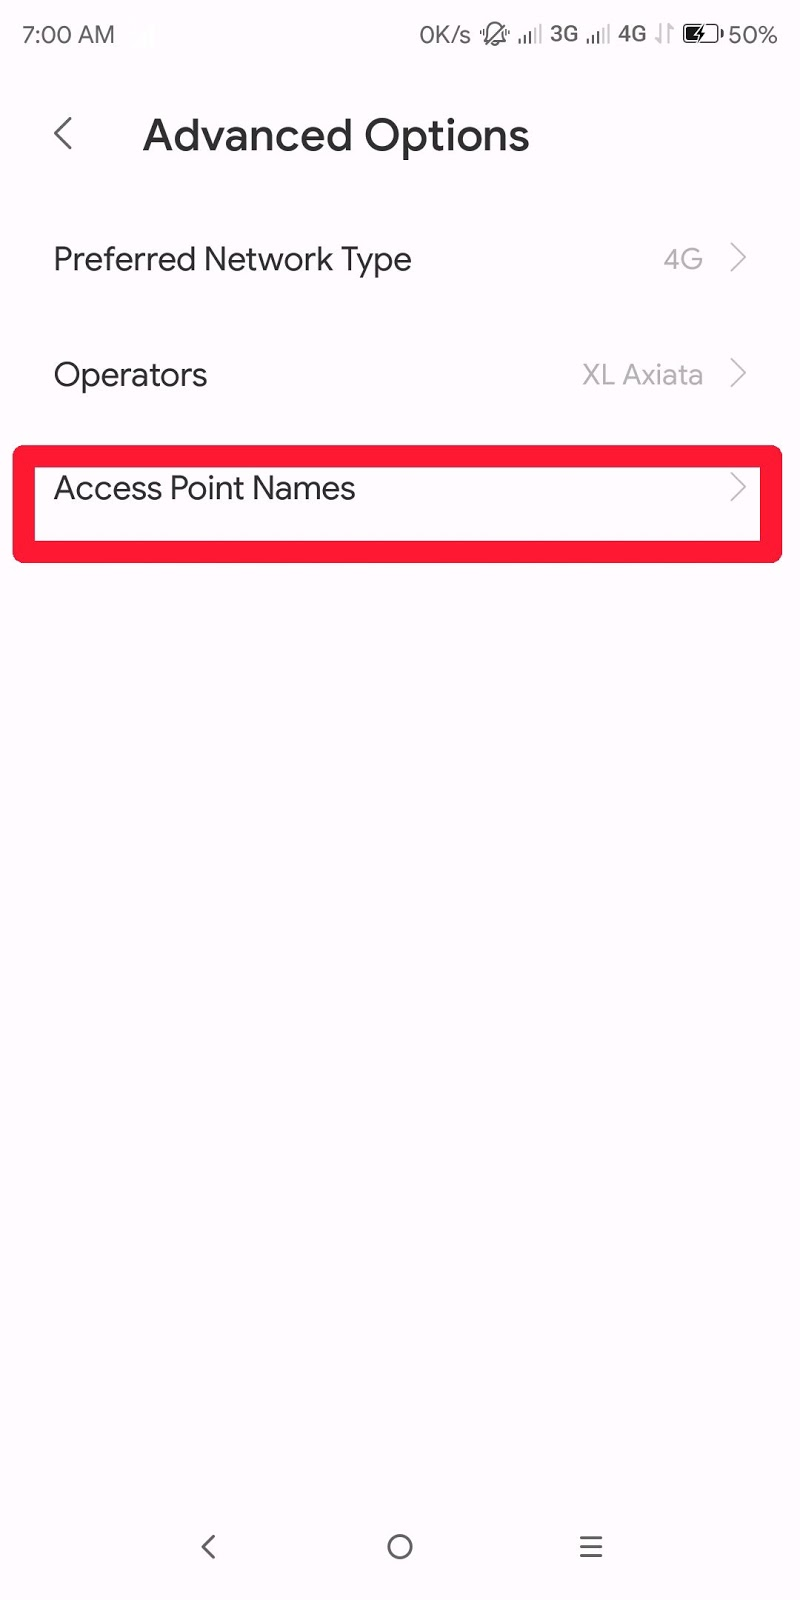 Cara Meningkatkan Kecepatan Internet di Android dengan Settingan APN